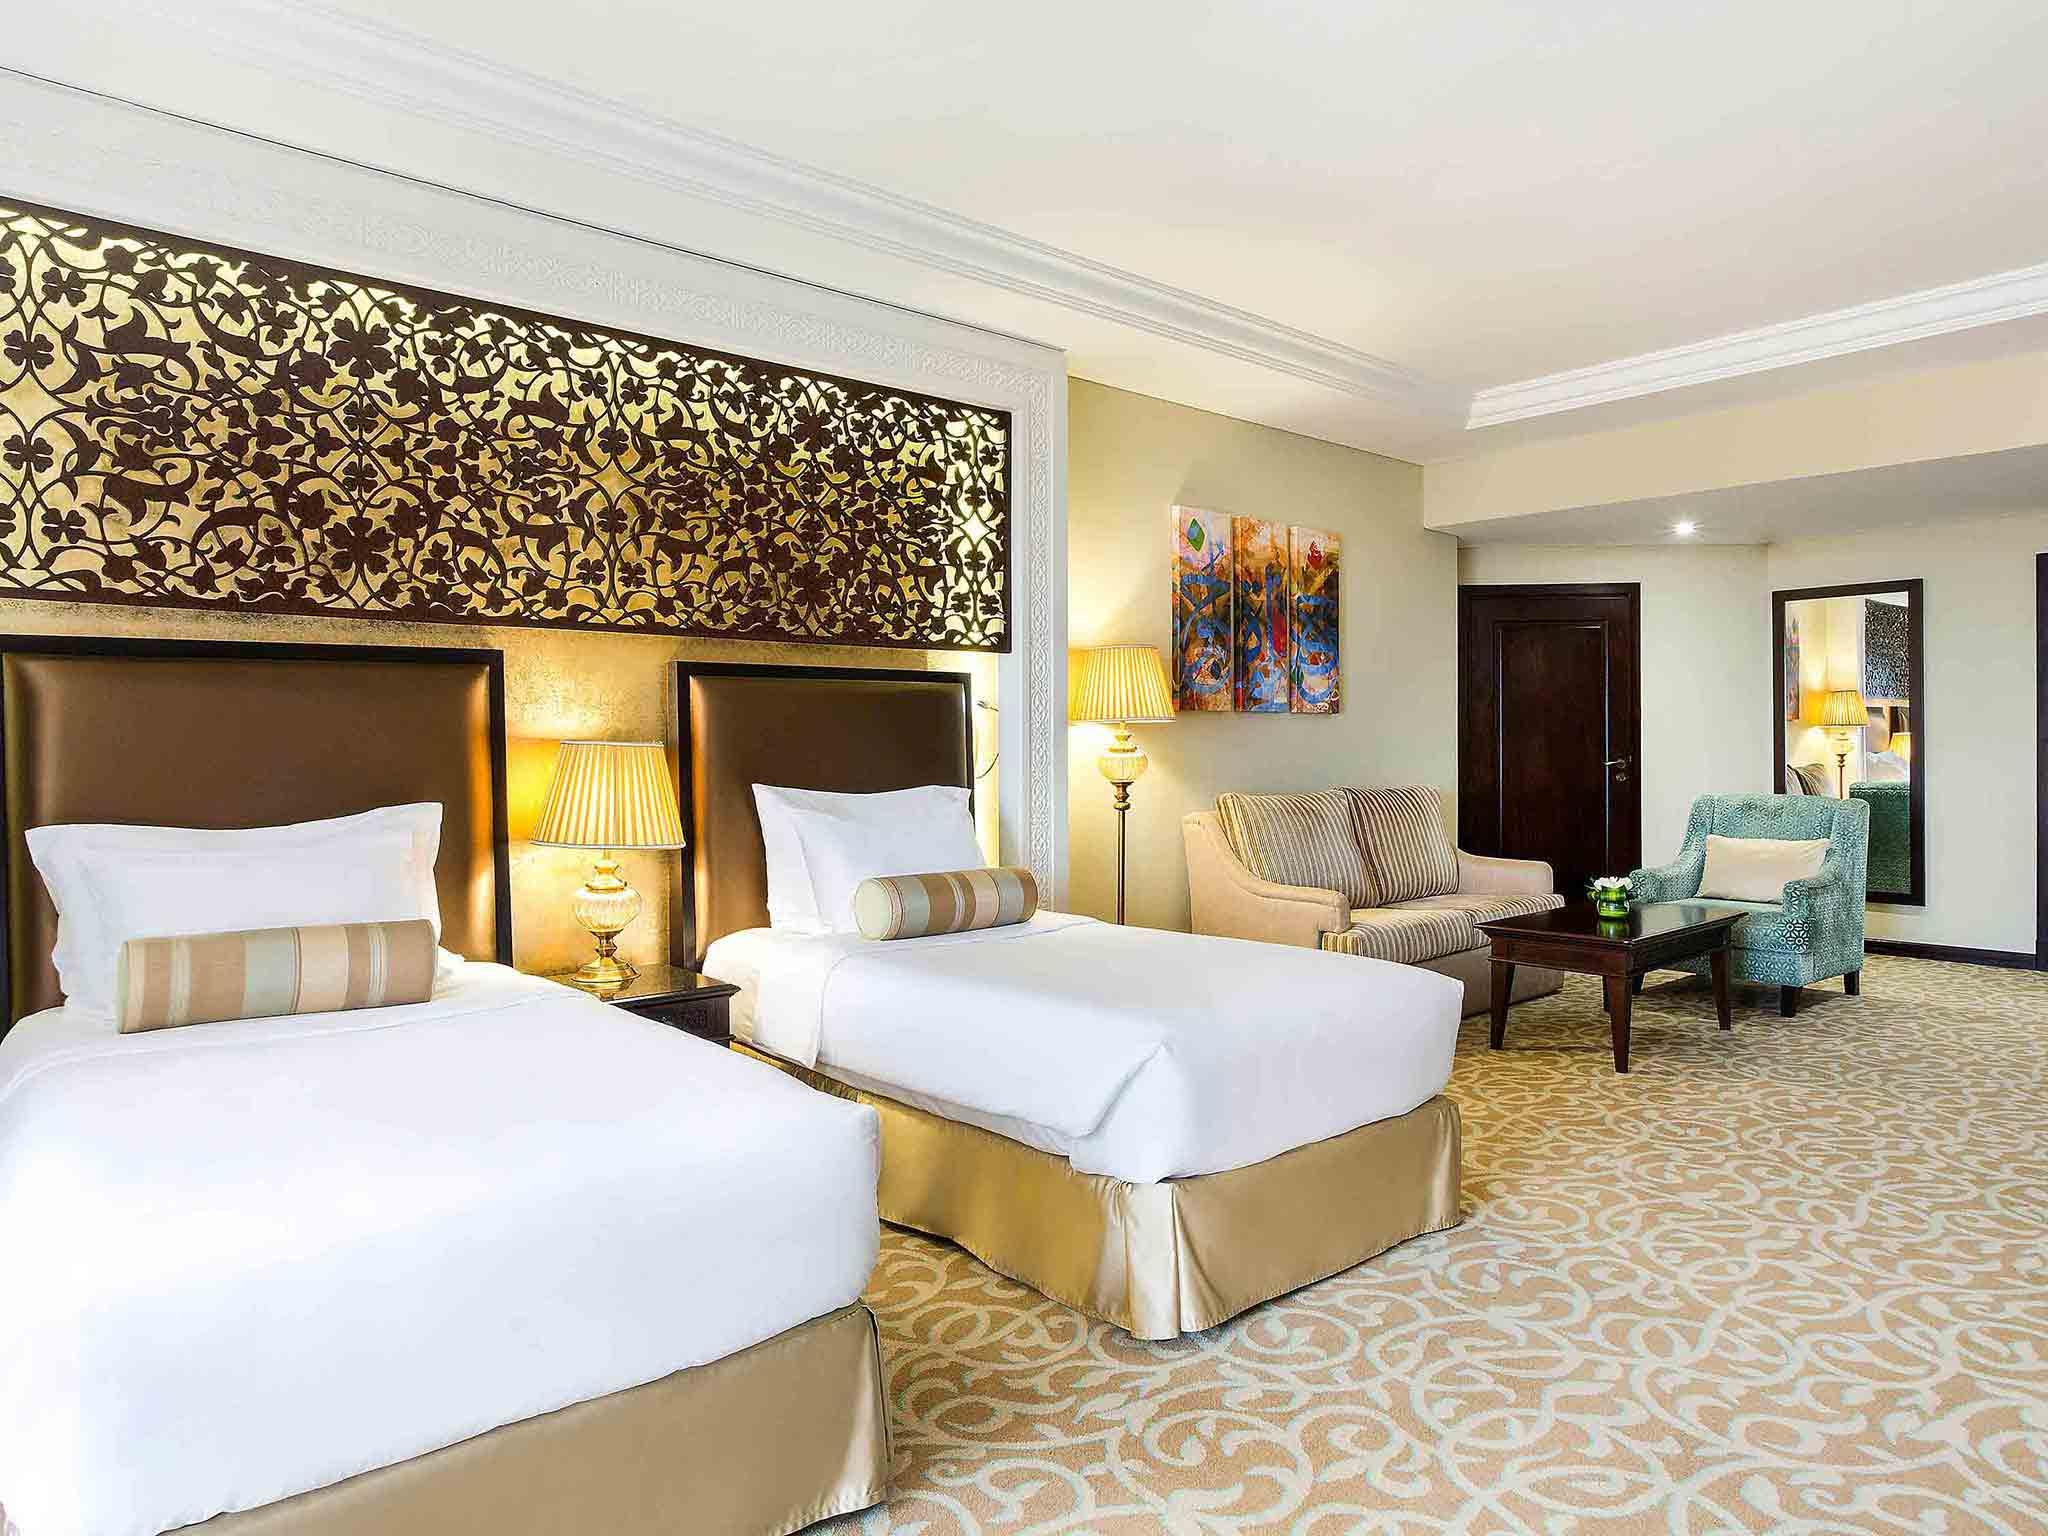 Bed apartment for sale in bab al bahr marjan island uae ras al -  Rooms Marjan Island Resort Spa Managed By Accorhotels